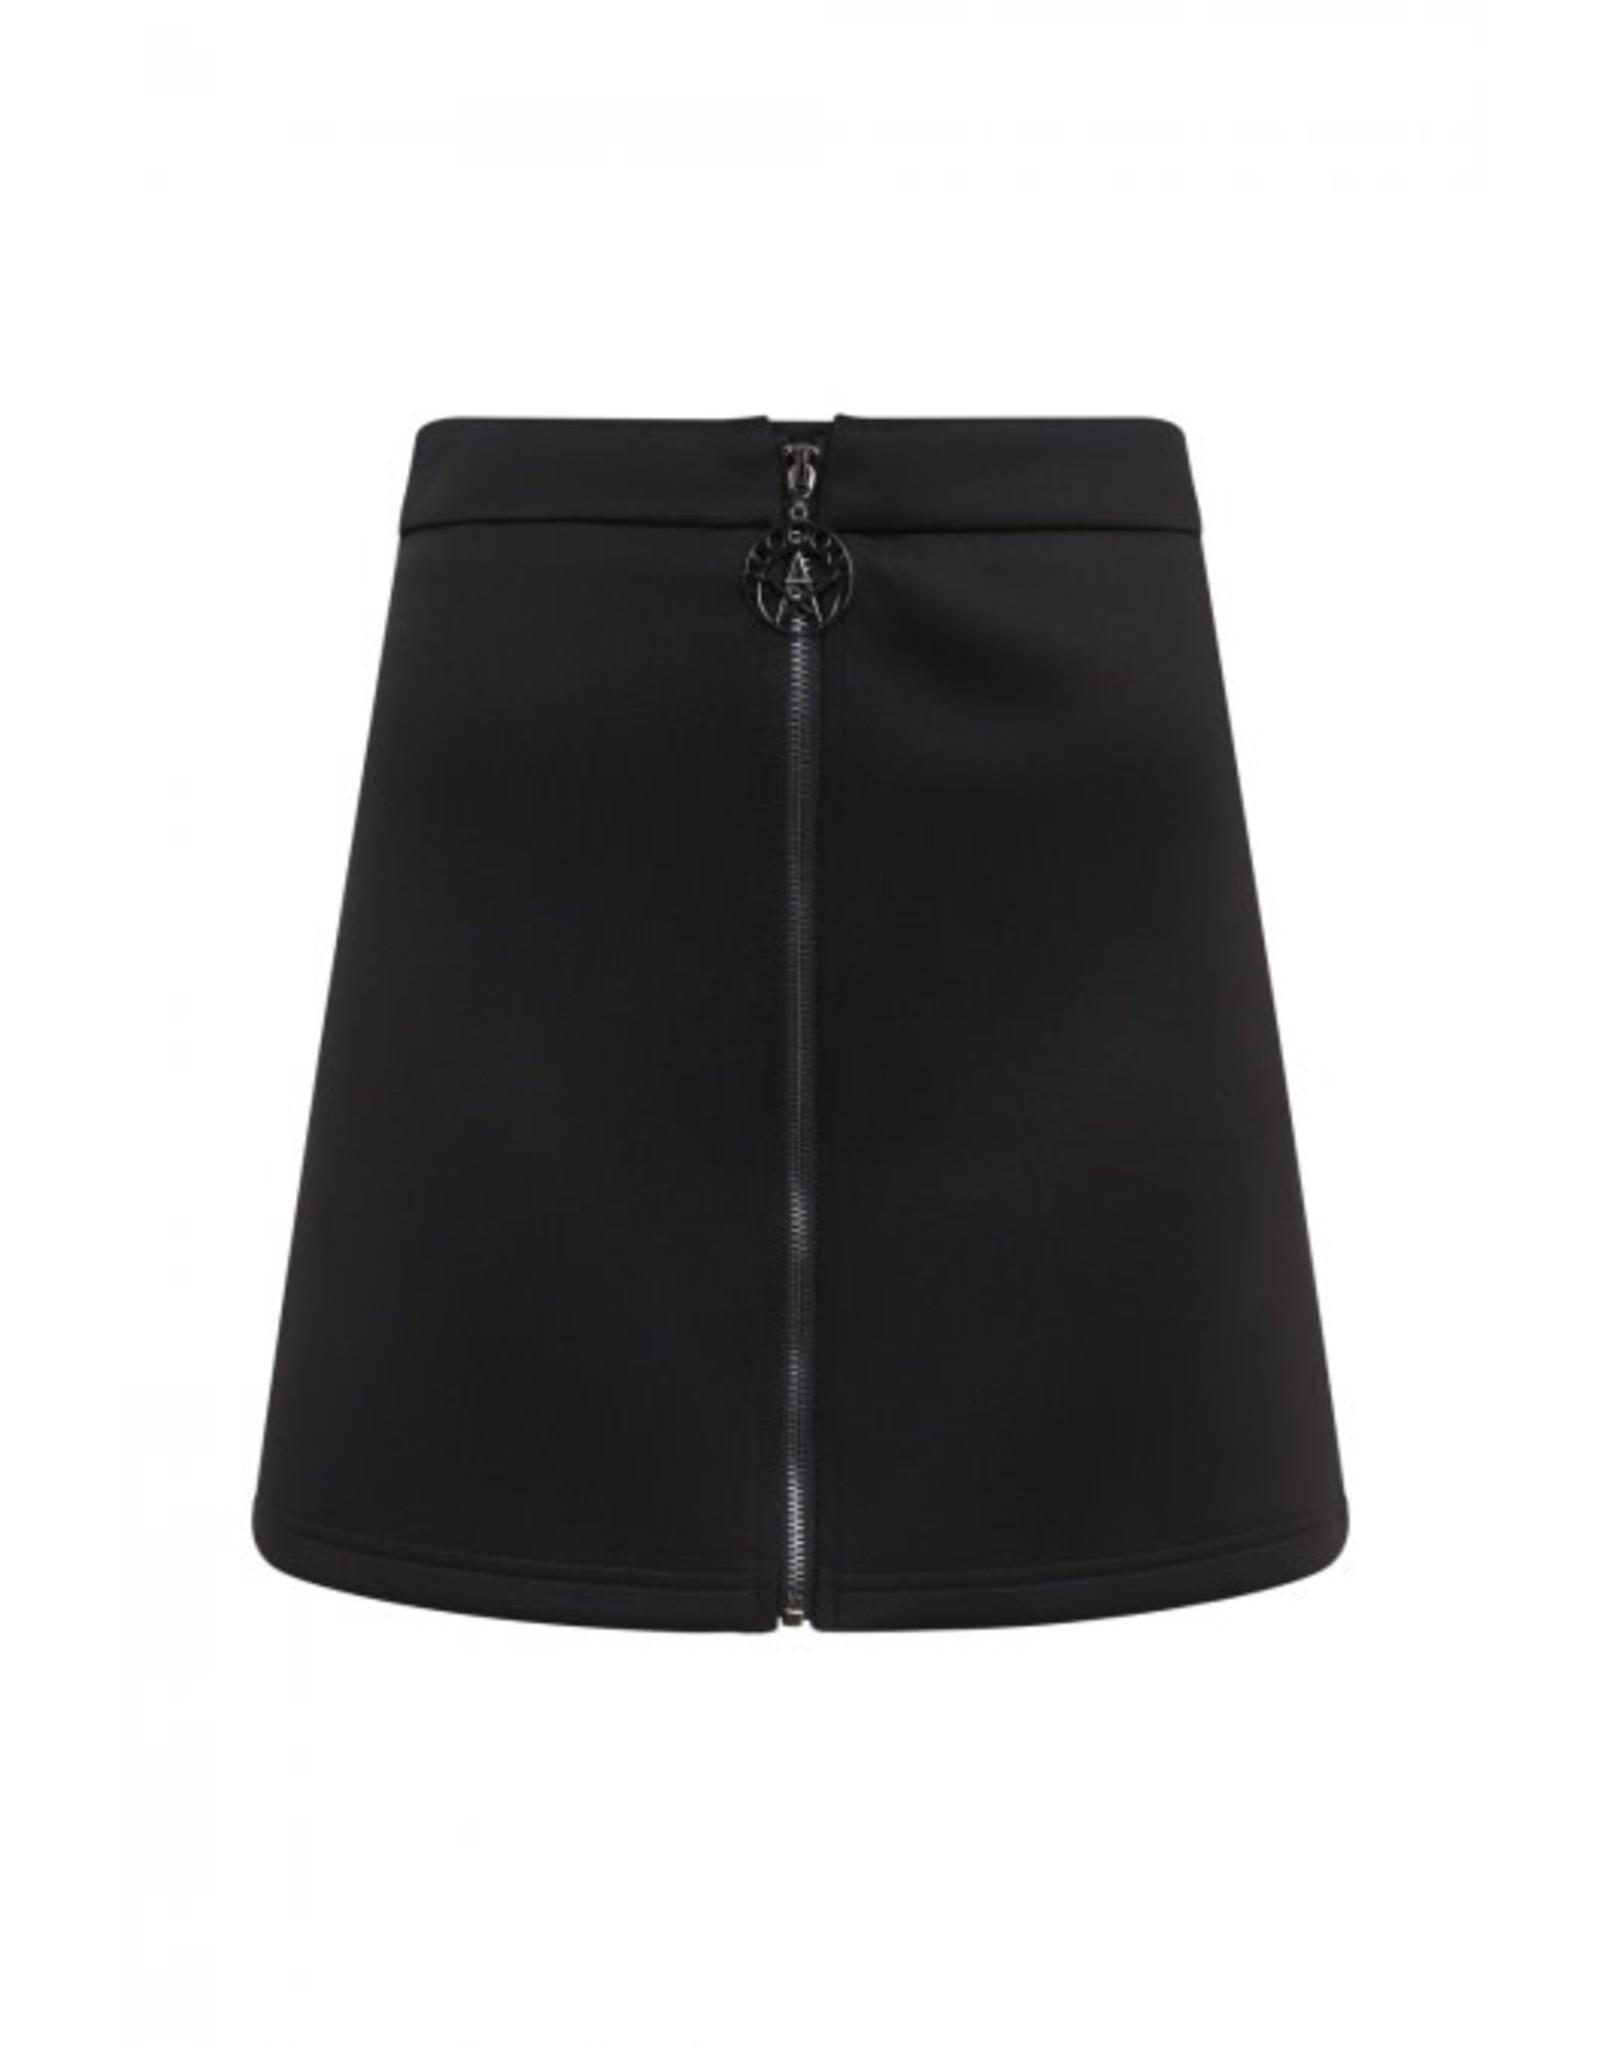 BANNED - Minimal Goth Bodycon Skirt